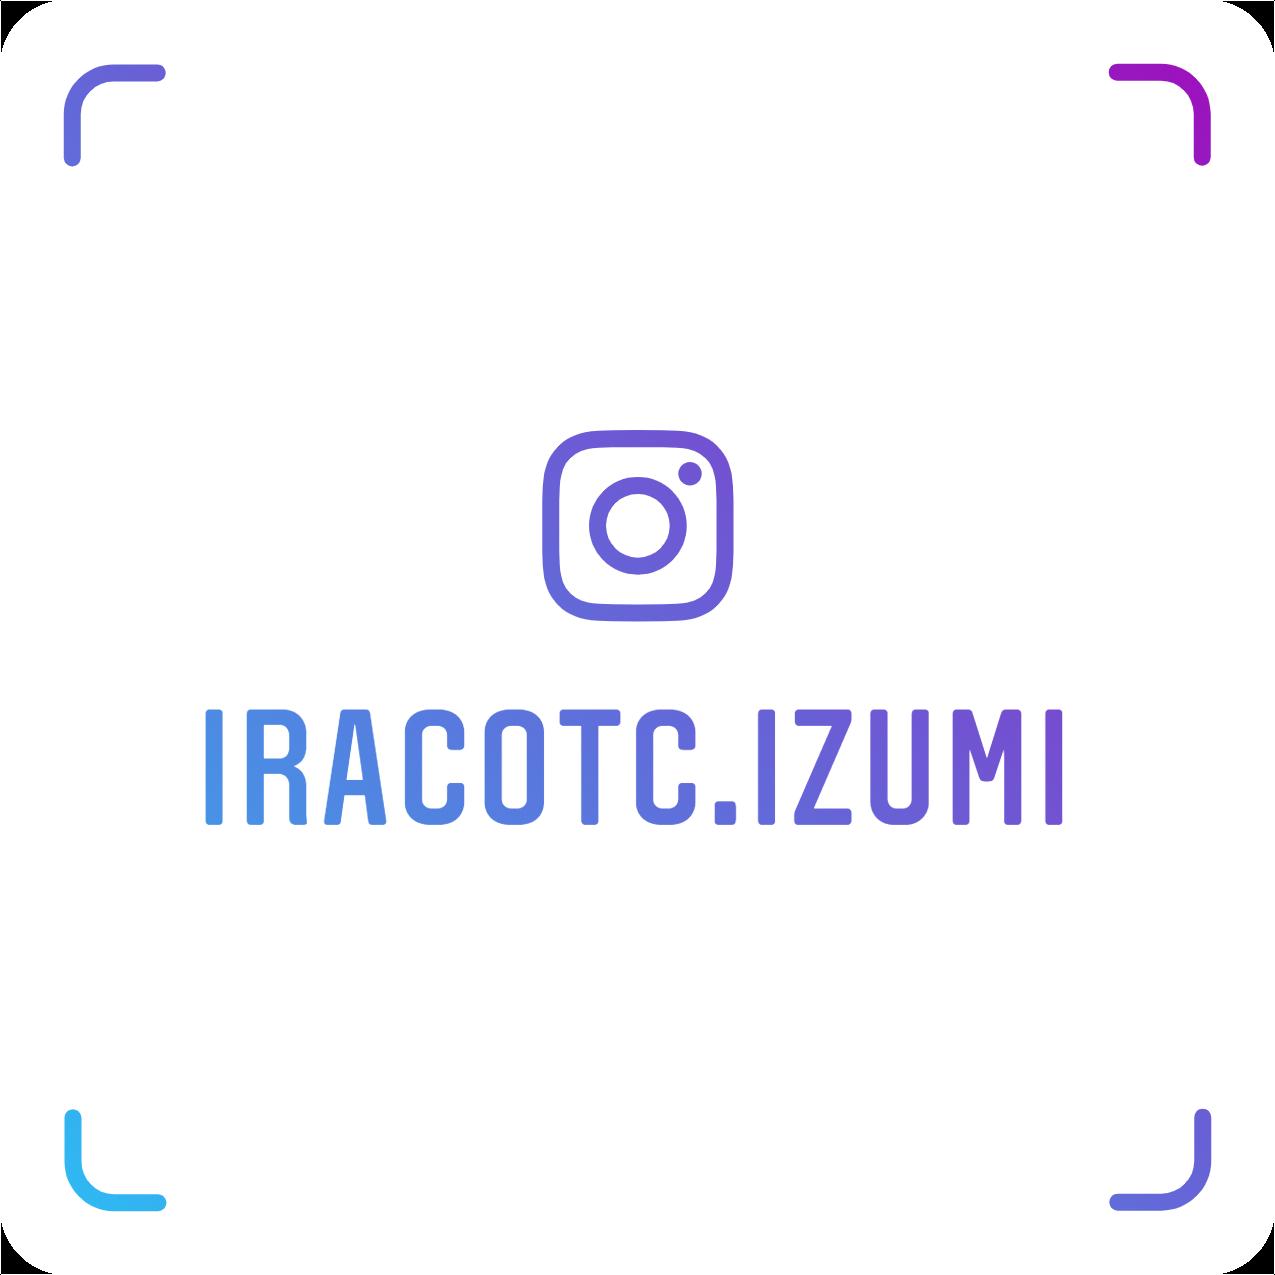 iracotc.izumi nametag 1 - 2019年度大会結果「1day大会」